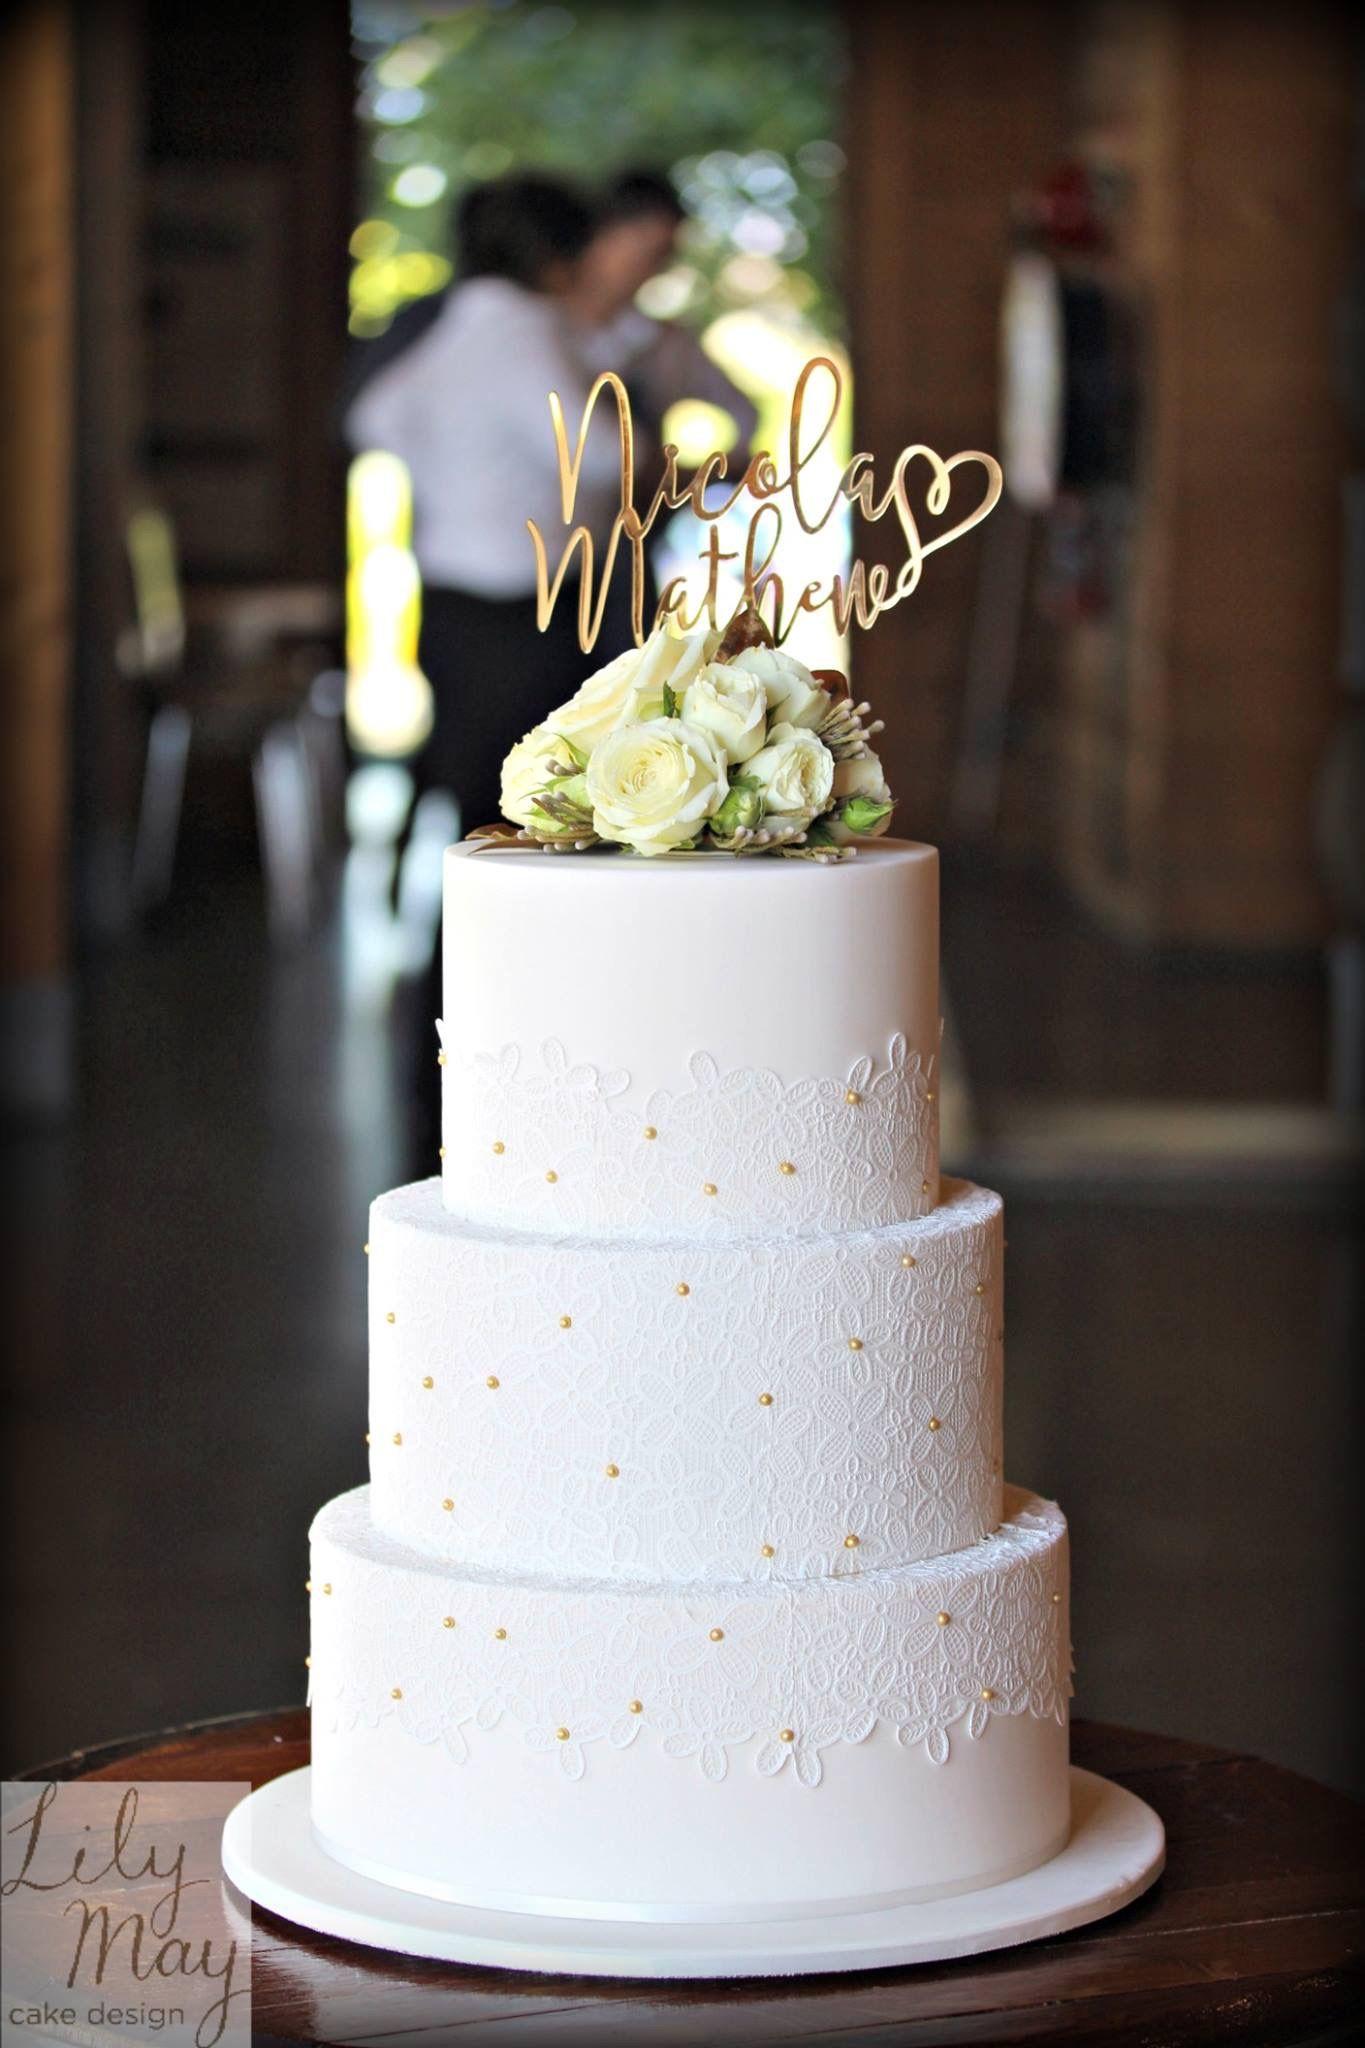 Simply elegant crisp white wedding cake finished with edible lace ...